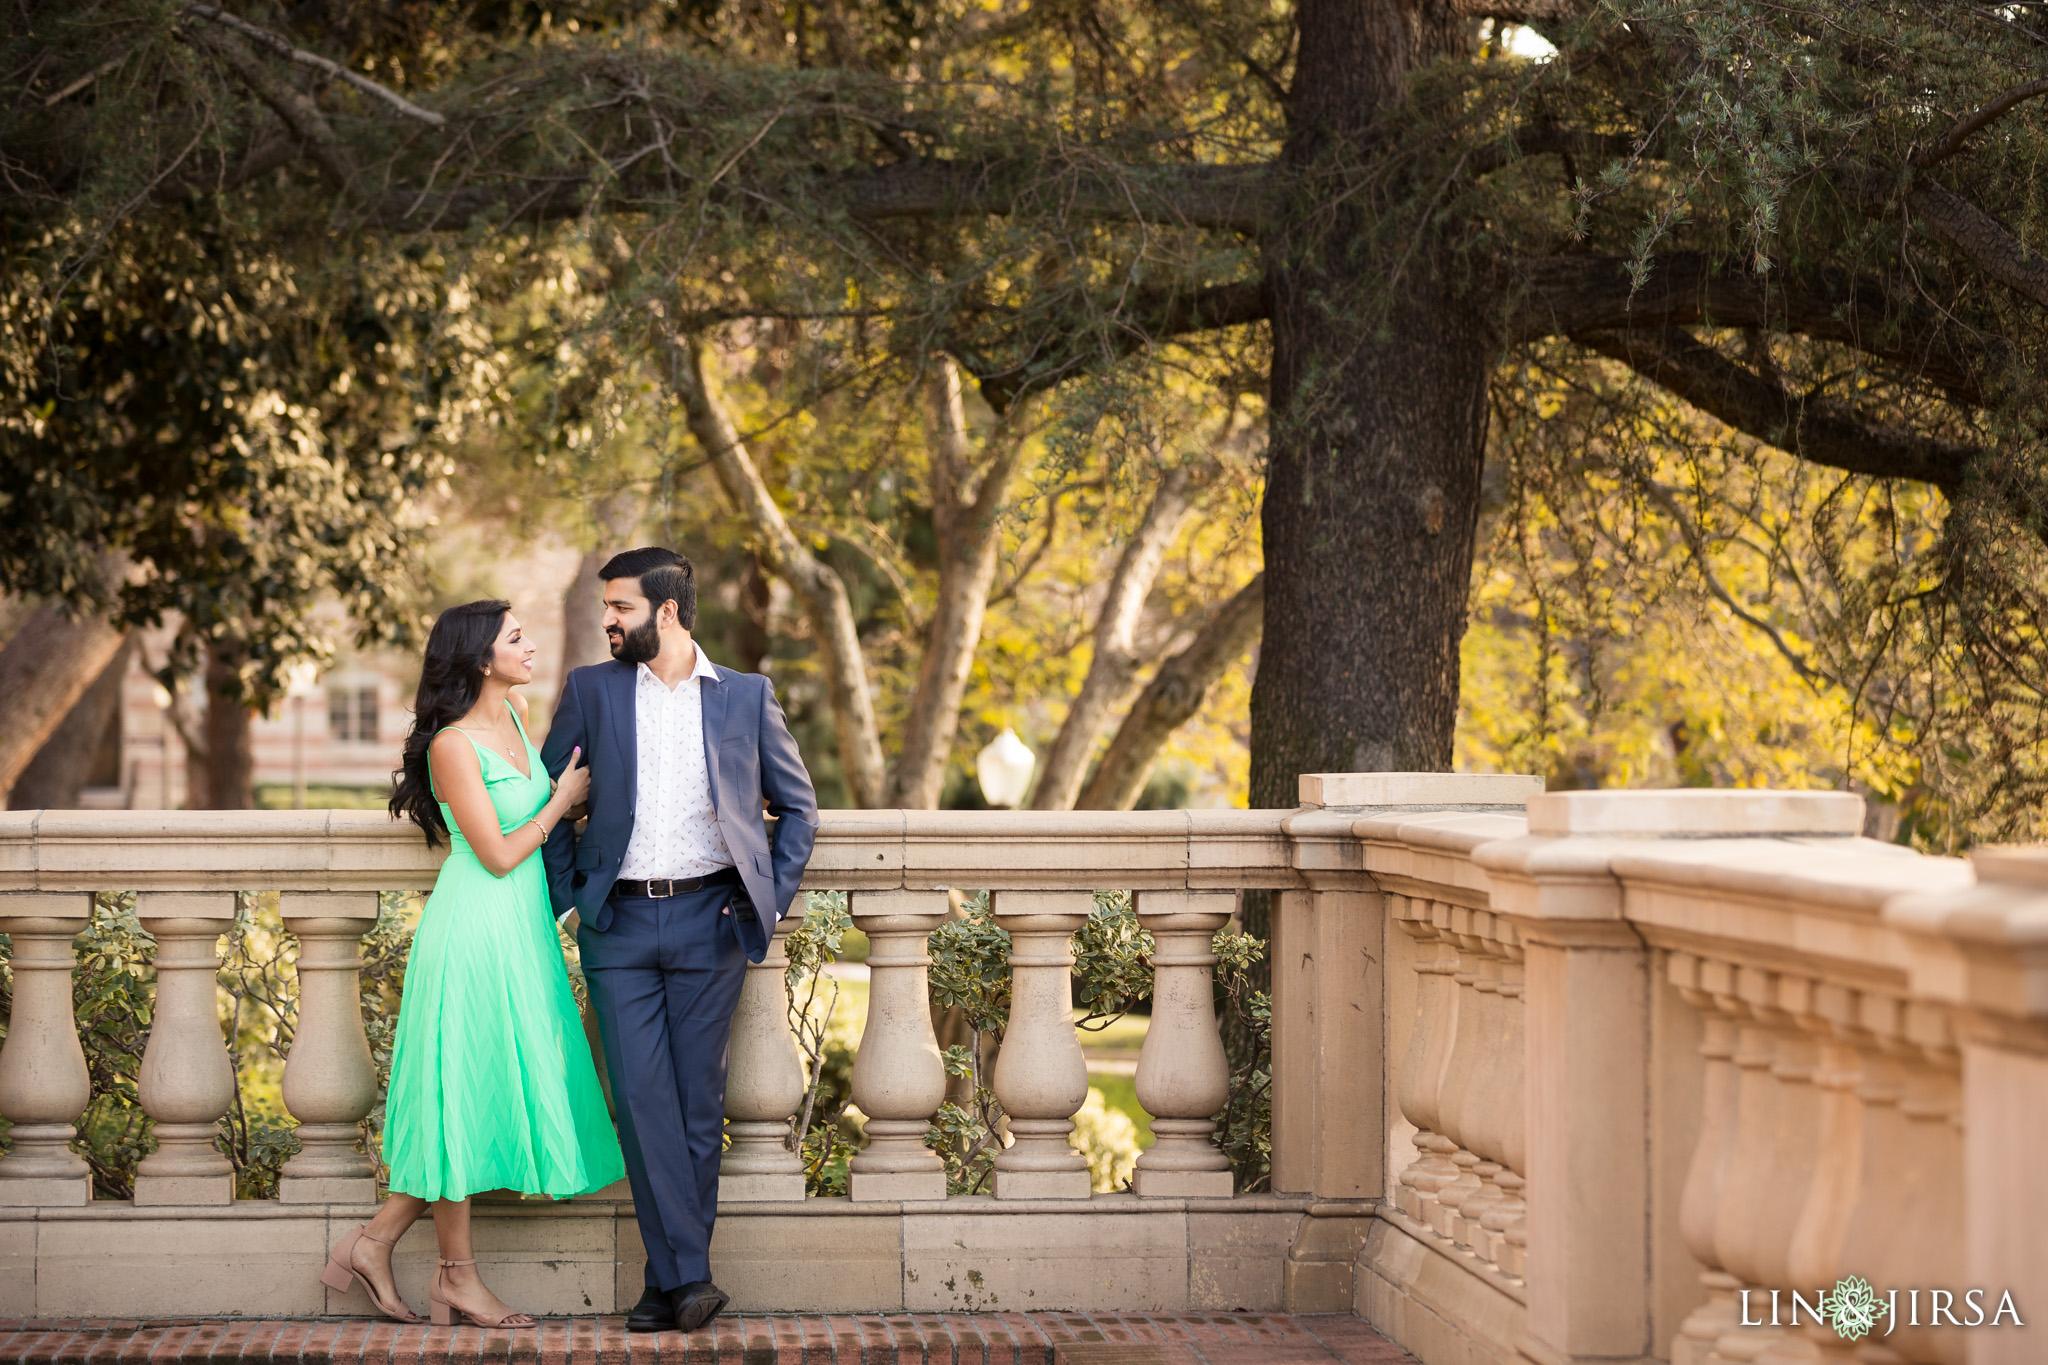 10-UCLA-Los-Angeles-Engagement-Photography